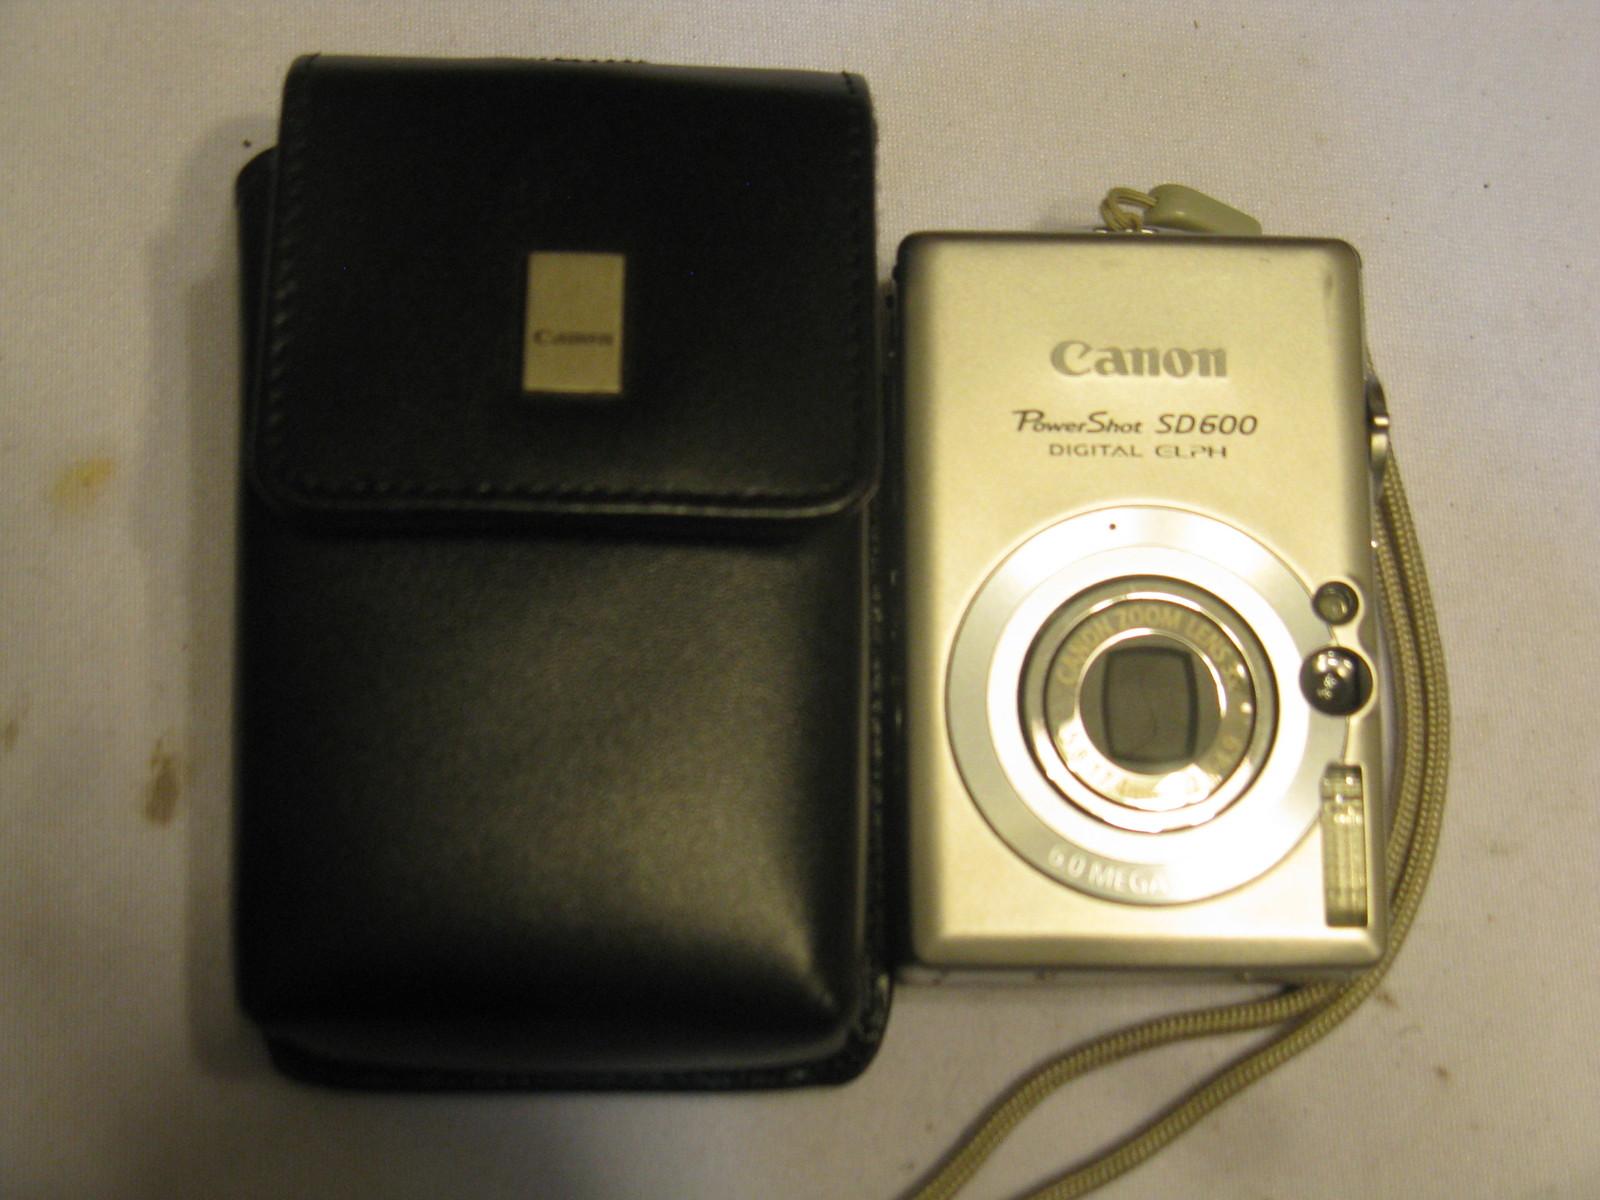 Canon PowerShot SD600 6MP Digital Elph And 16 Similar Items